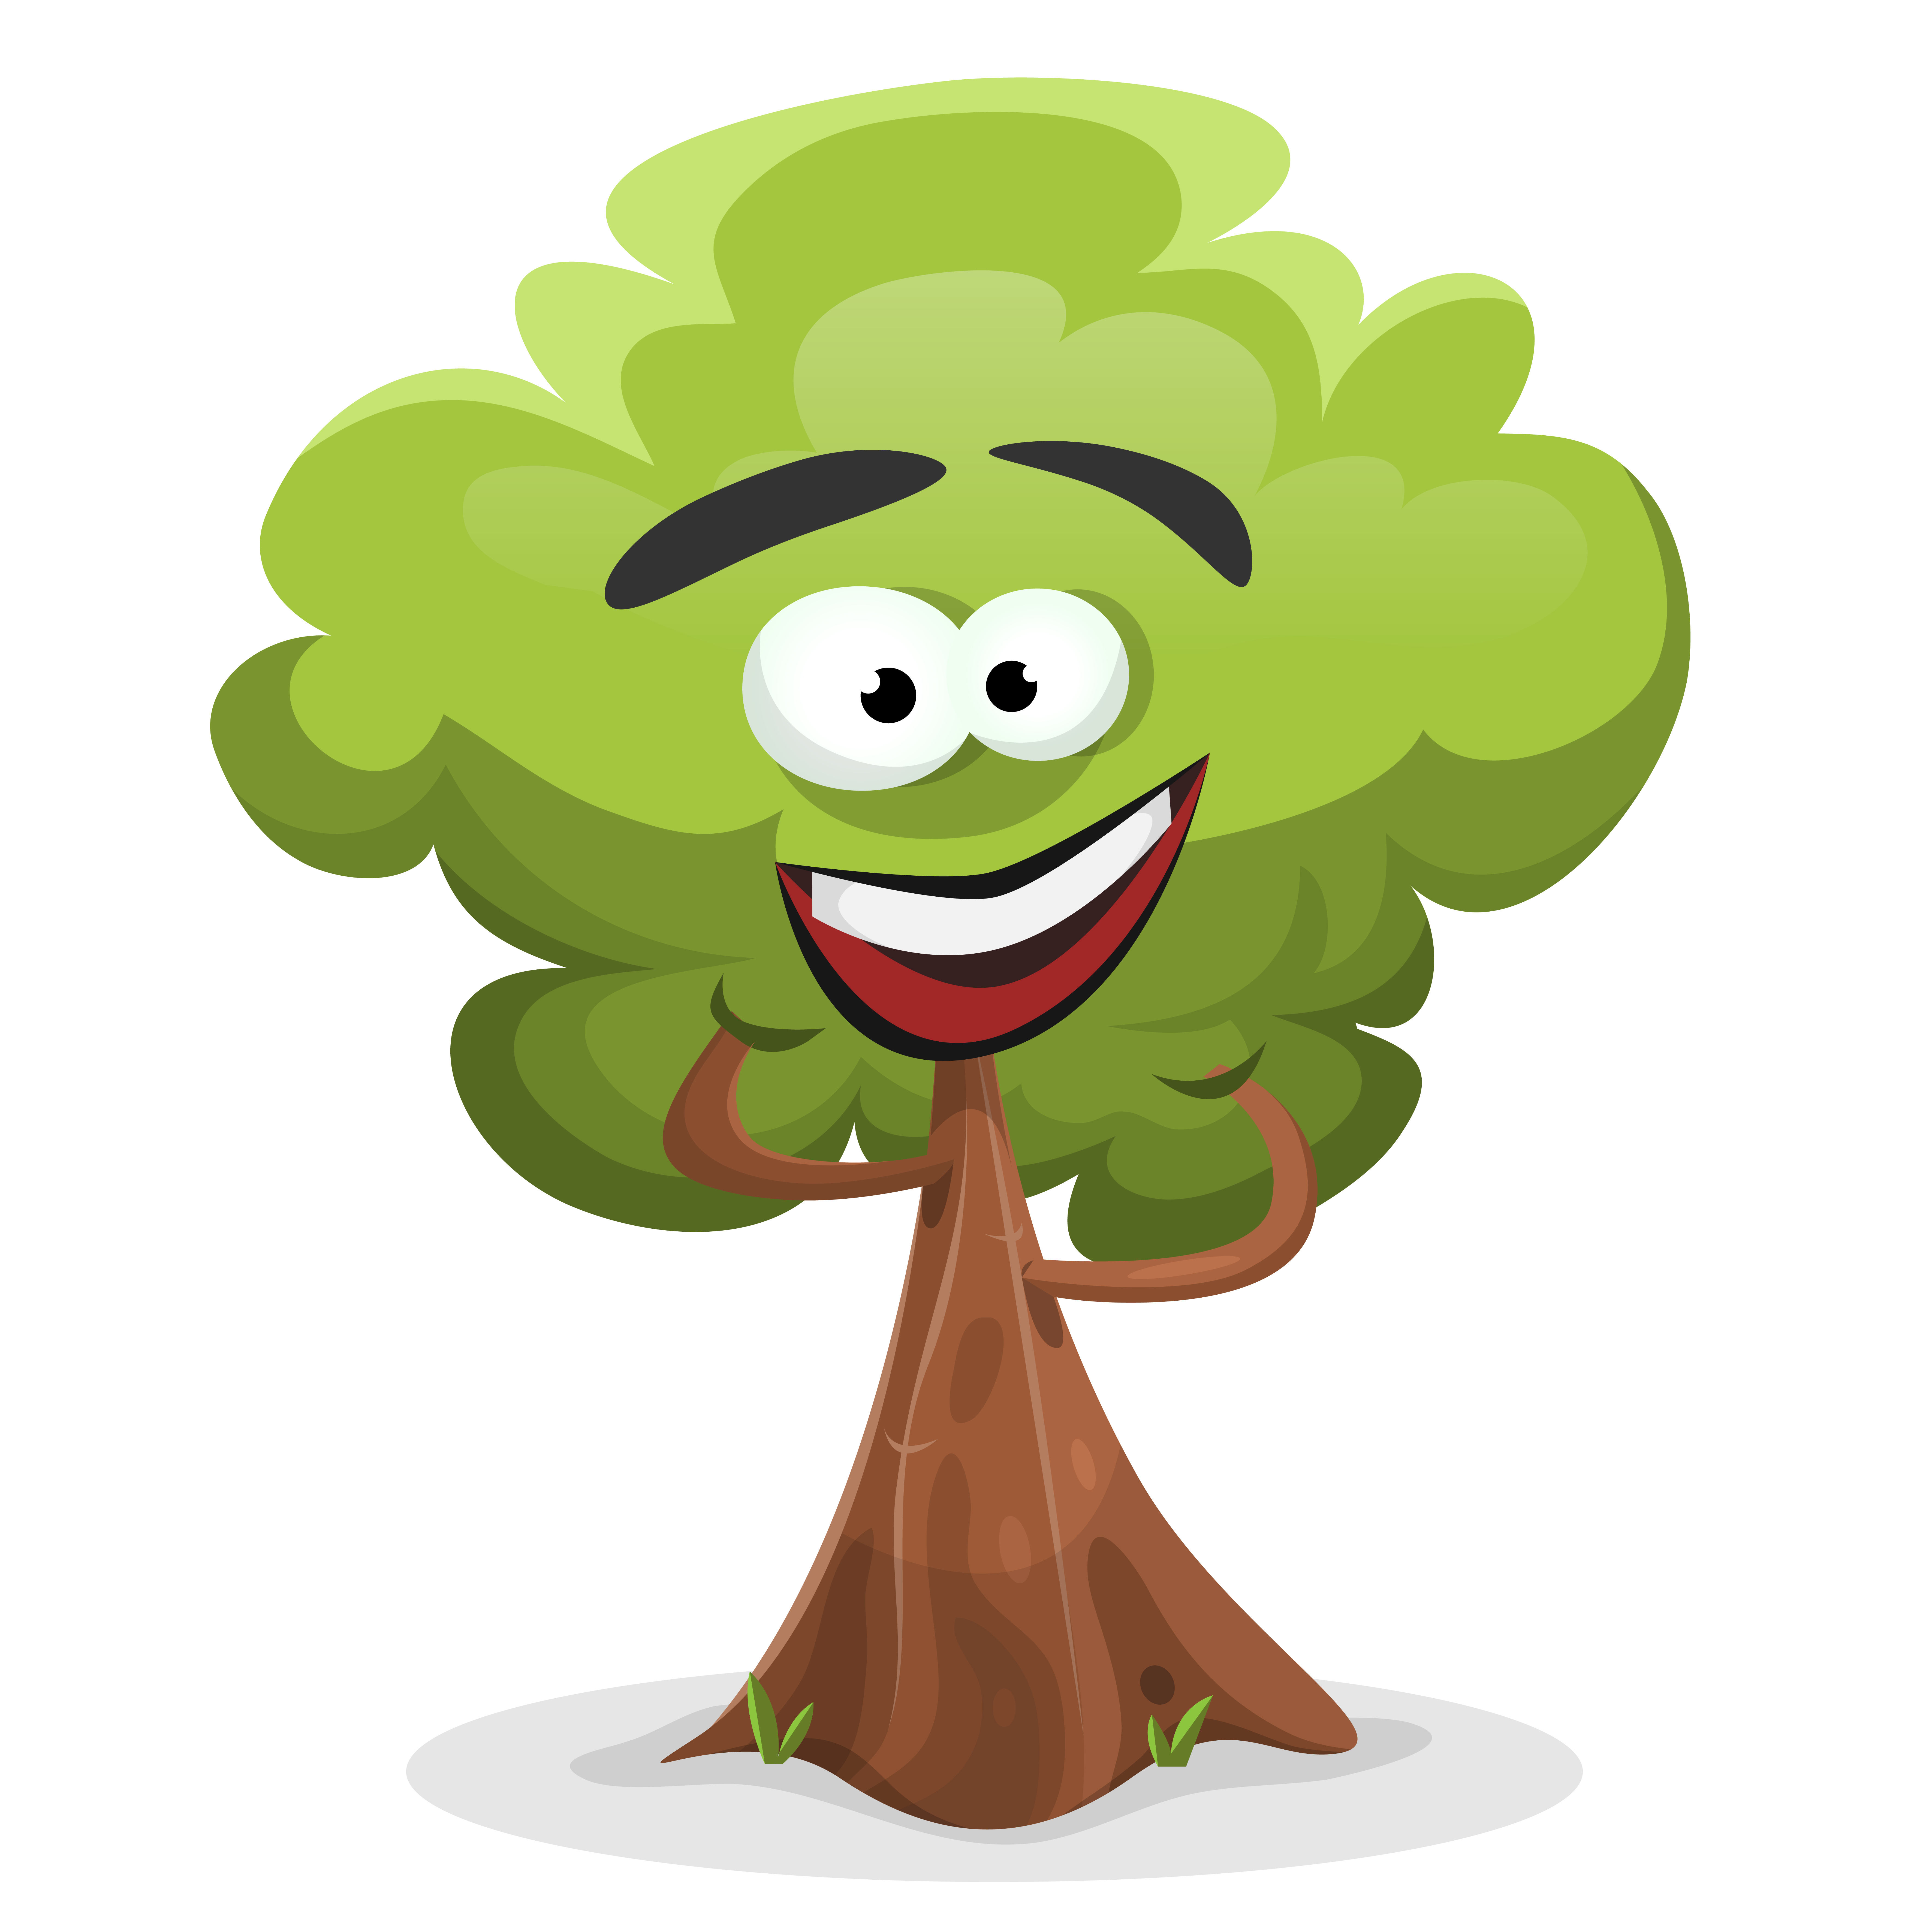 Funny Cartoon Tree Character - Download Free Vectors ...